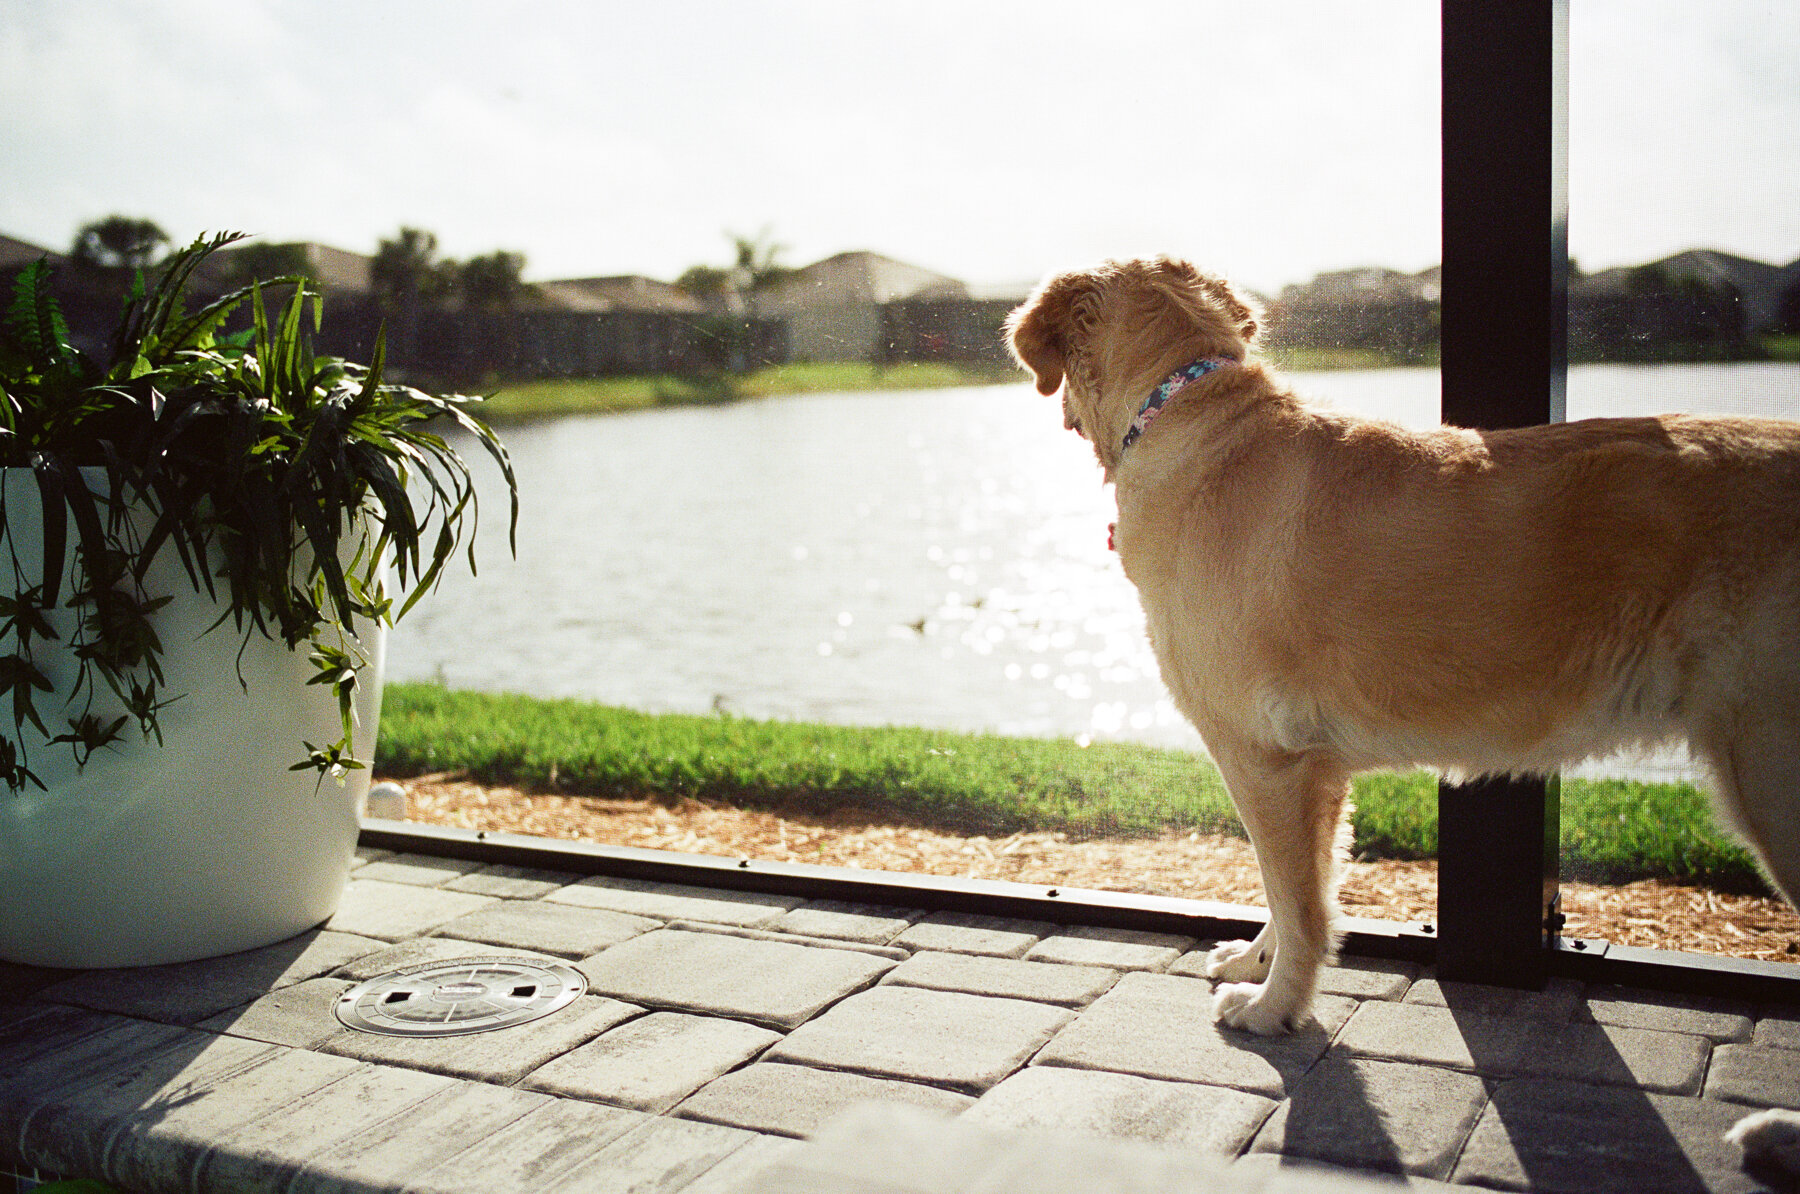 Leica-M6-Pool-Chloe-5.jpg